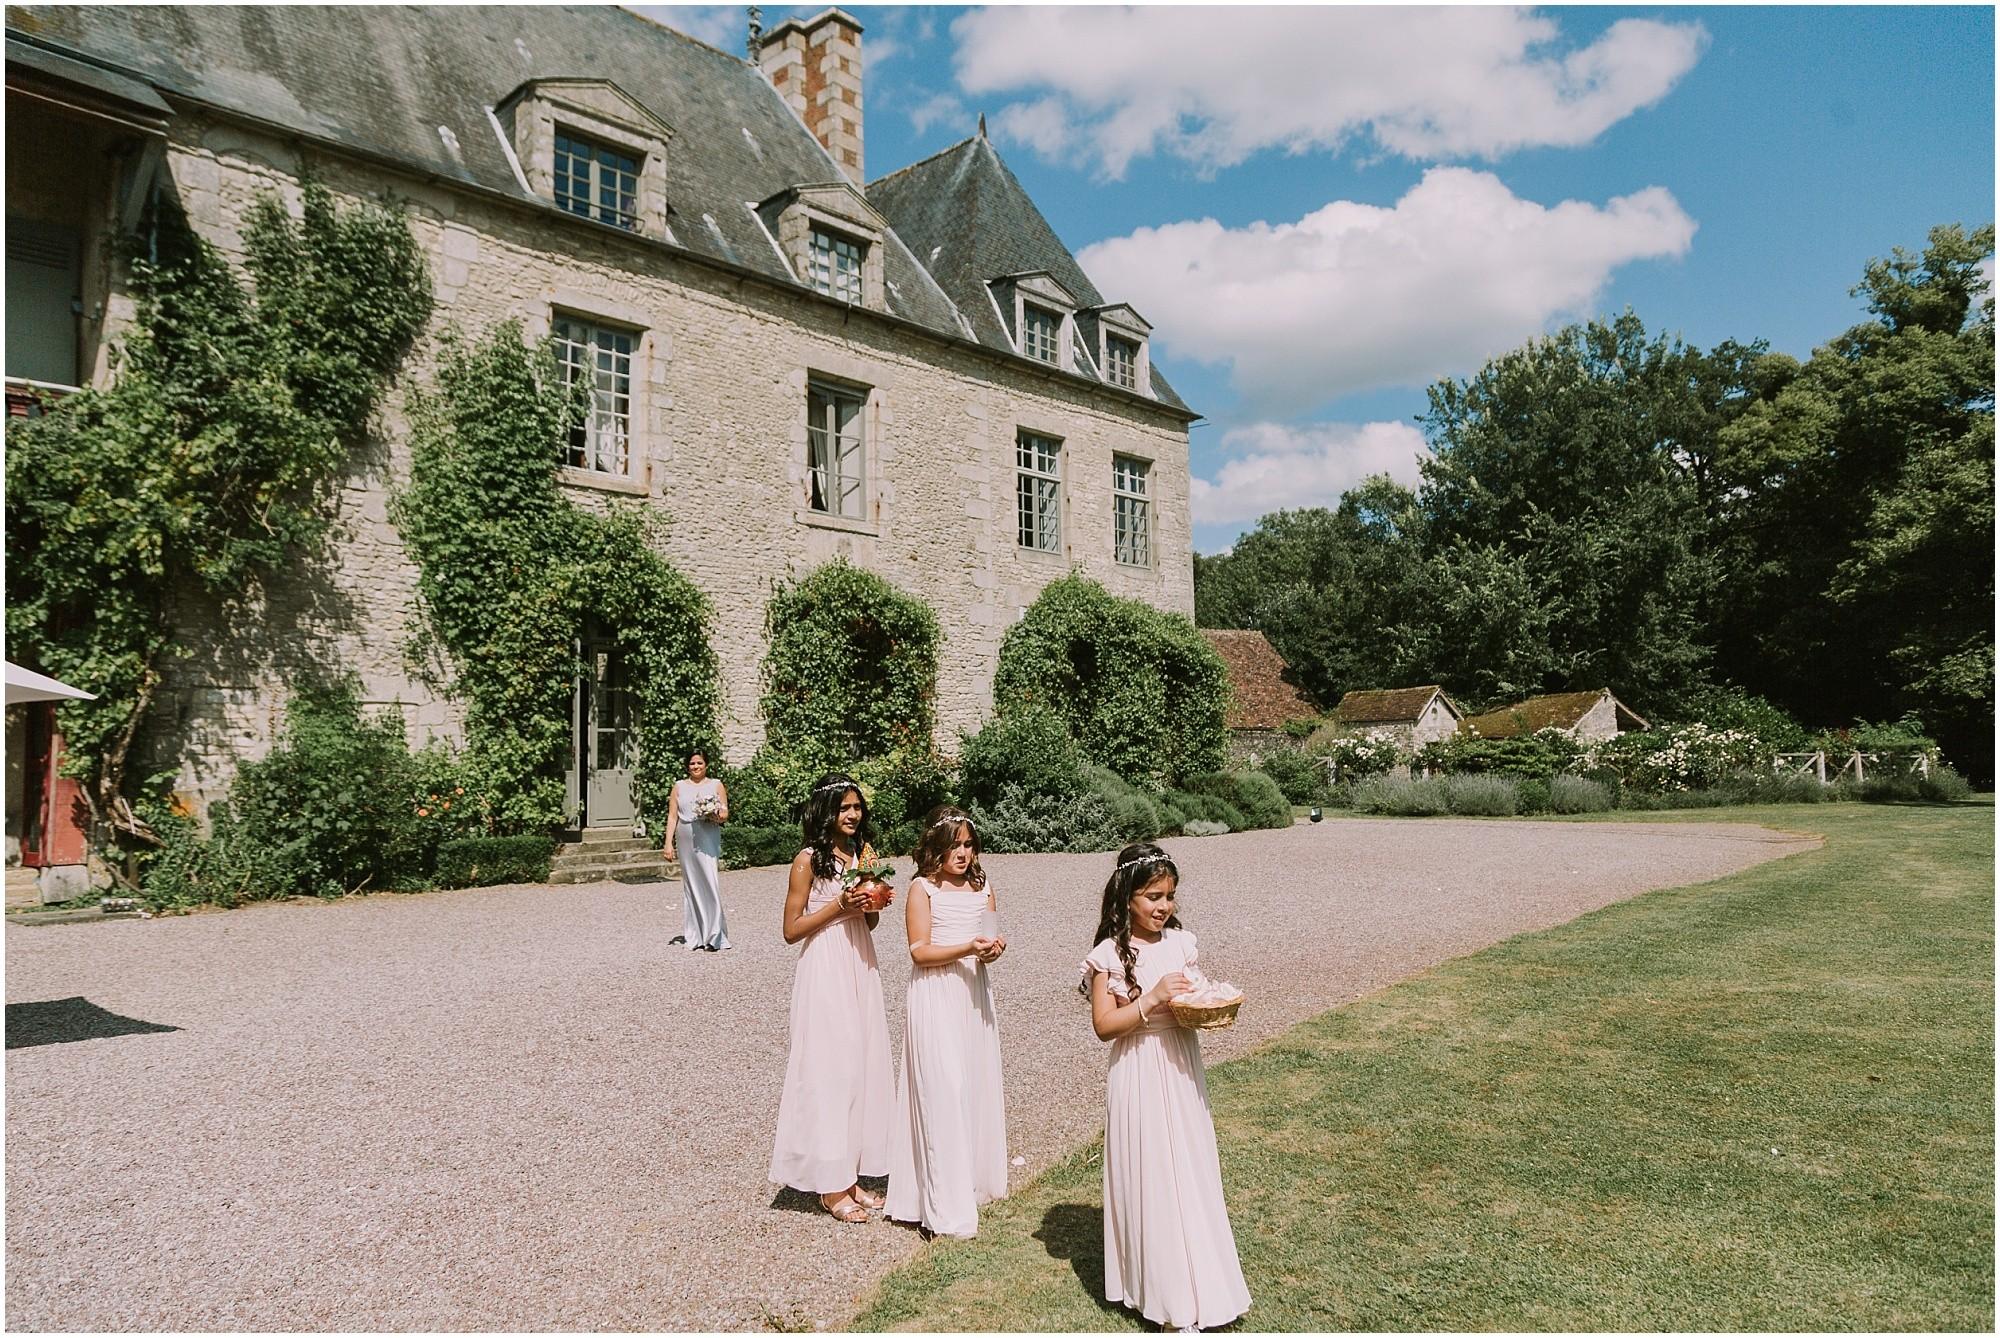 Kateryna-photos-photographer-mariage-chateau-saint-paterne-alencon-normandie-mayenne-le-mans_0057.jpg